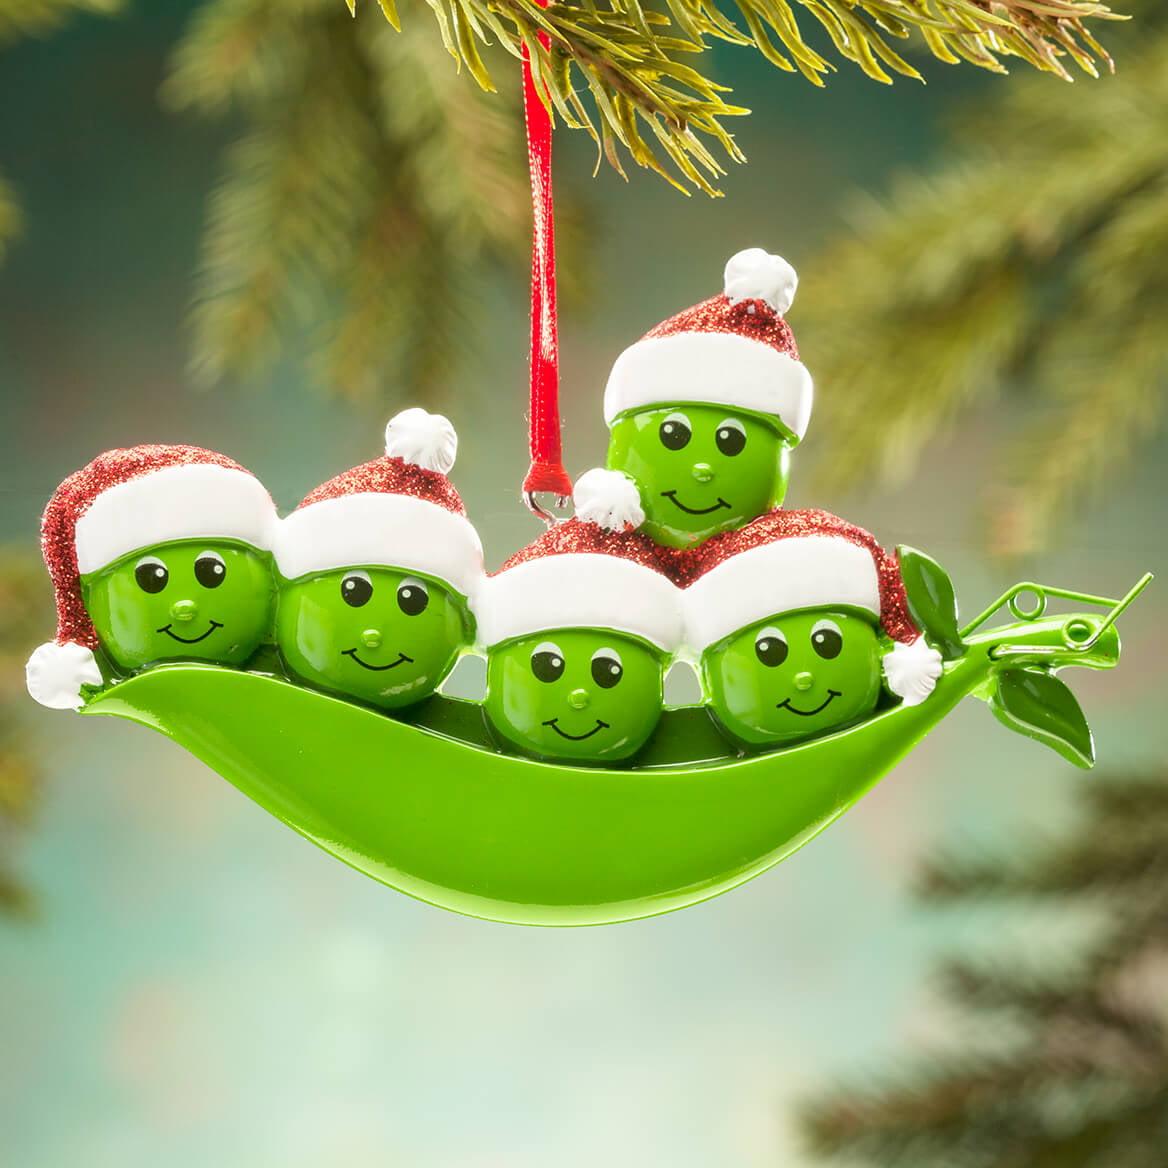 Pea Pod Family of 2 3 4 5 6 7 8 9 Peas Personalized  Christmas Ornament